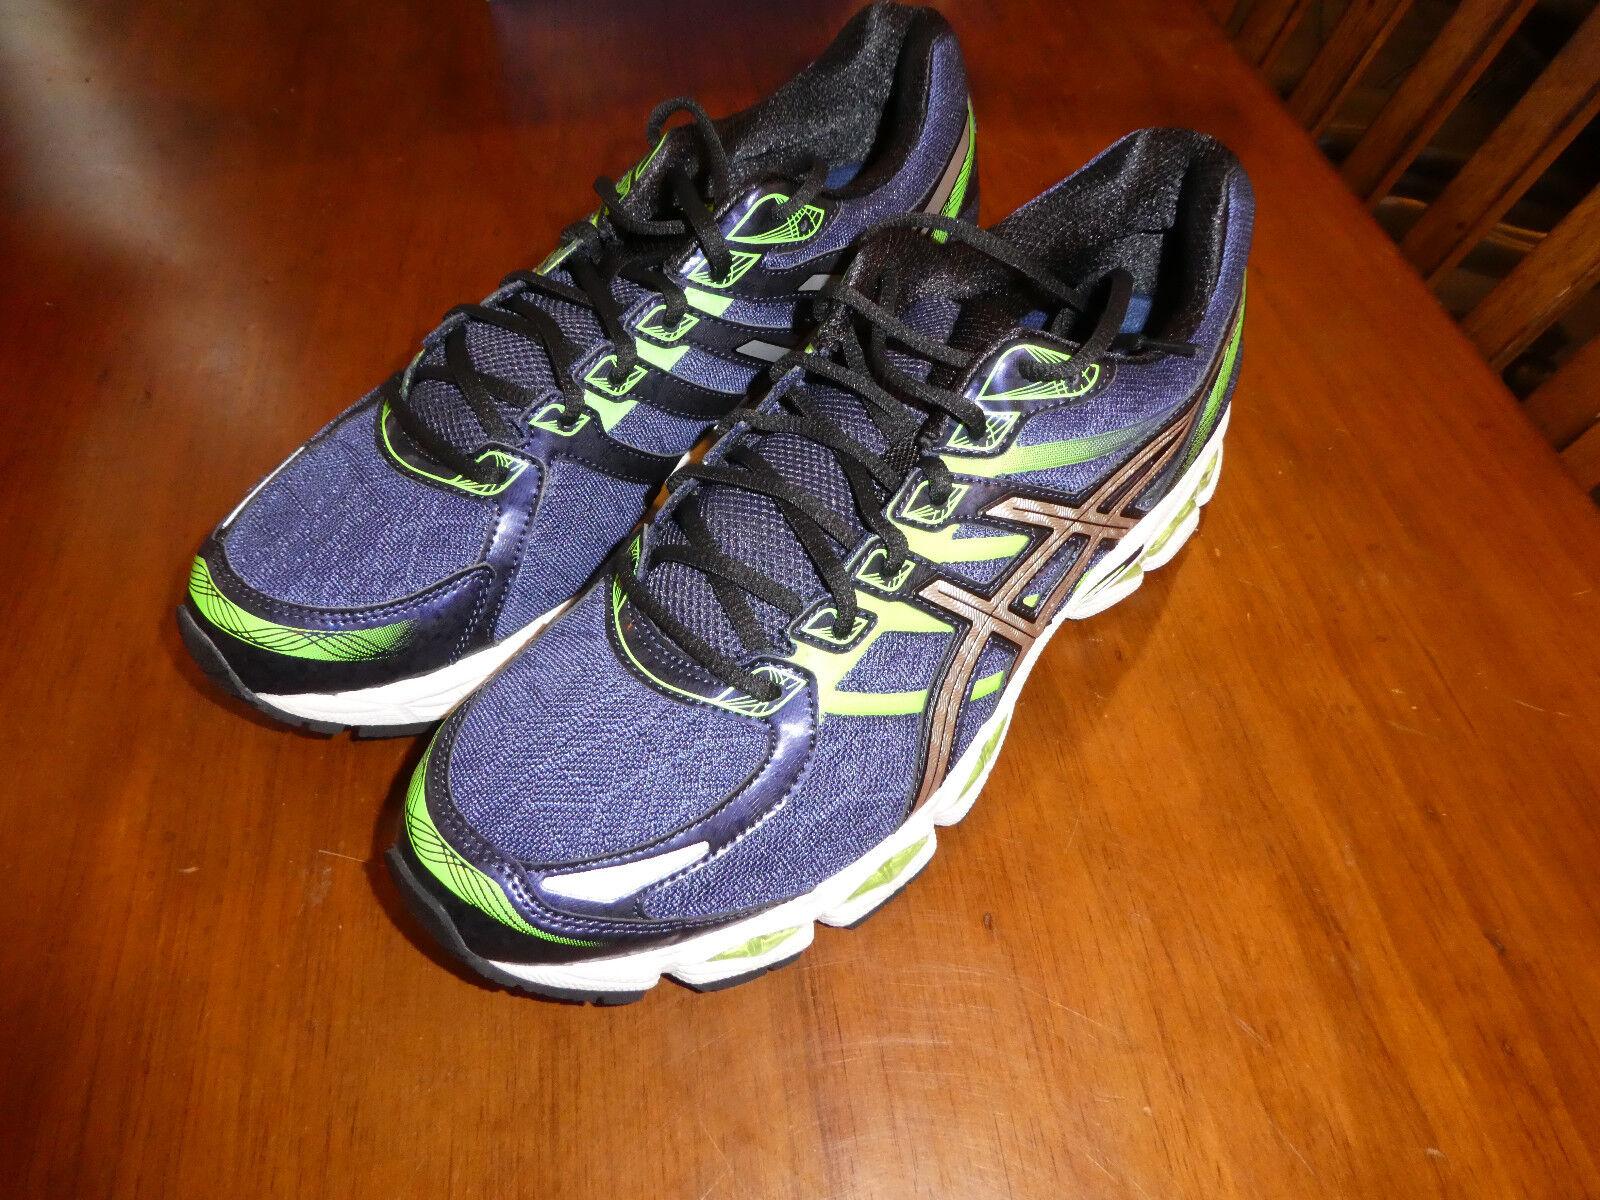 Asics Uomo Gel Evate 3 Uomo Scarpe new size 11.5 style T516N 6091 scarpe da ginnastica